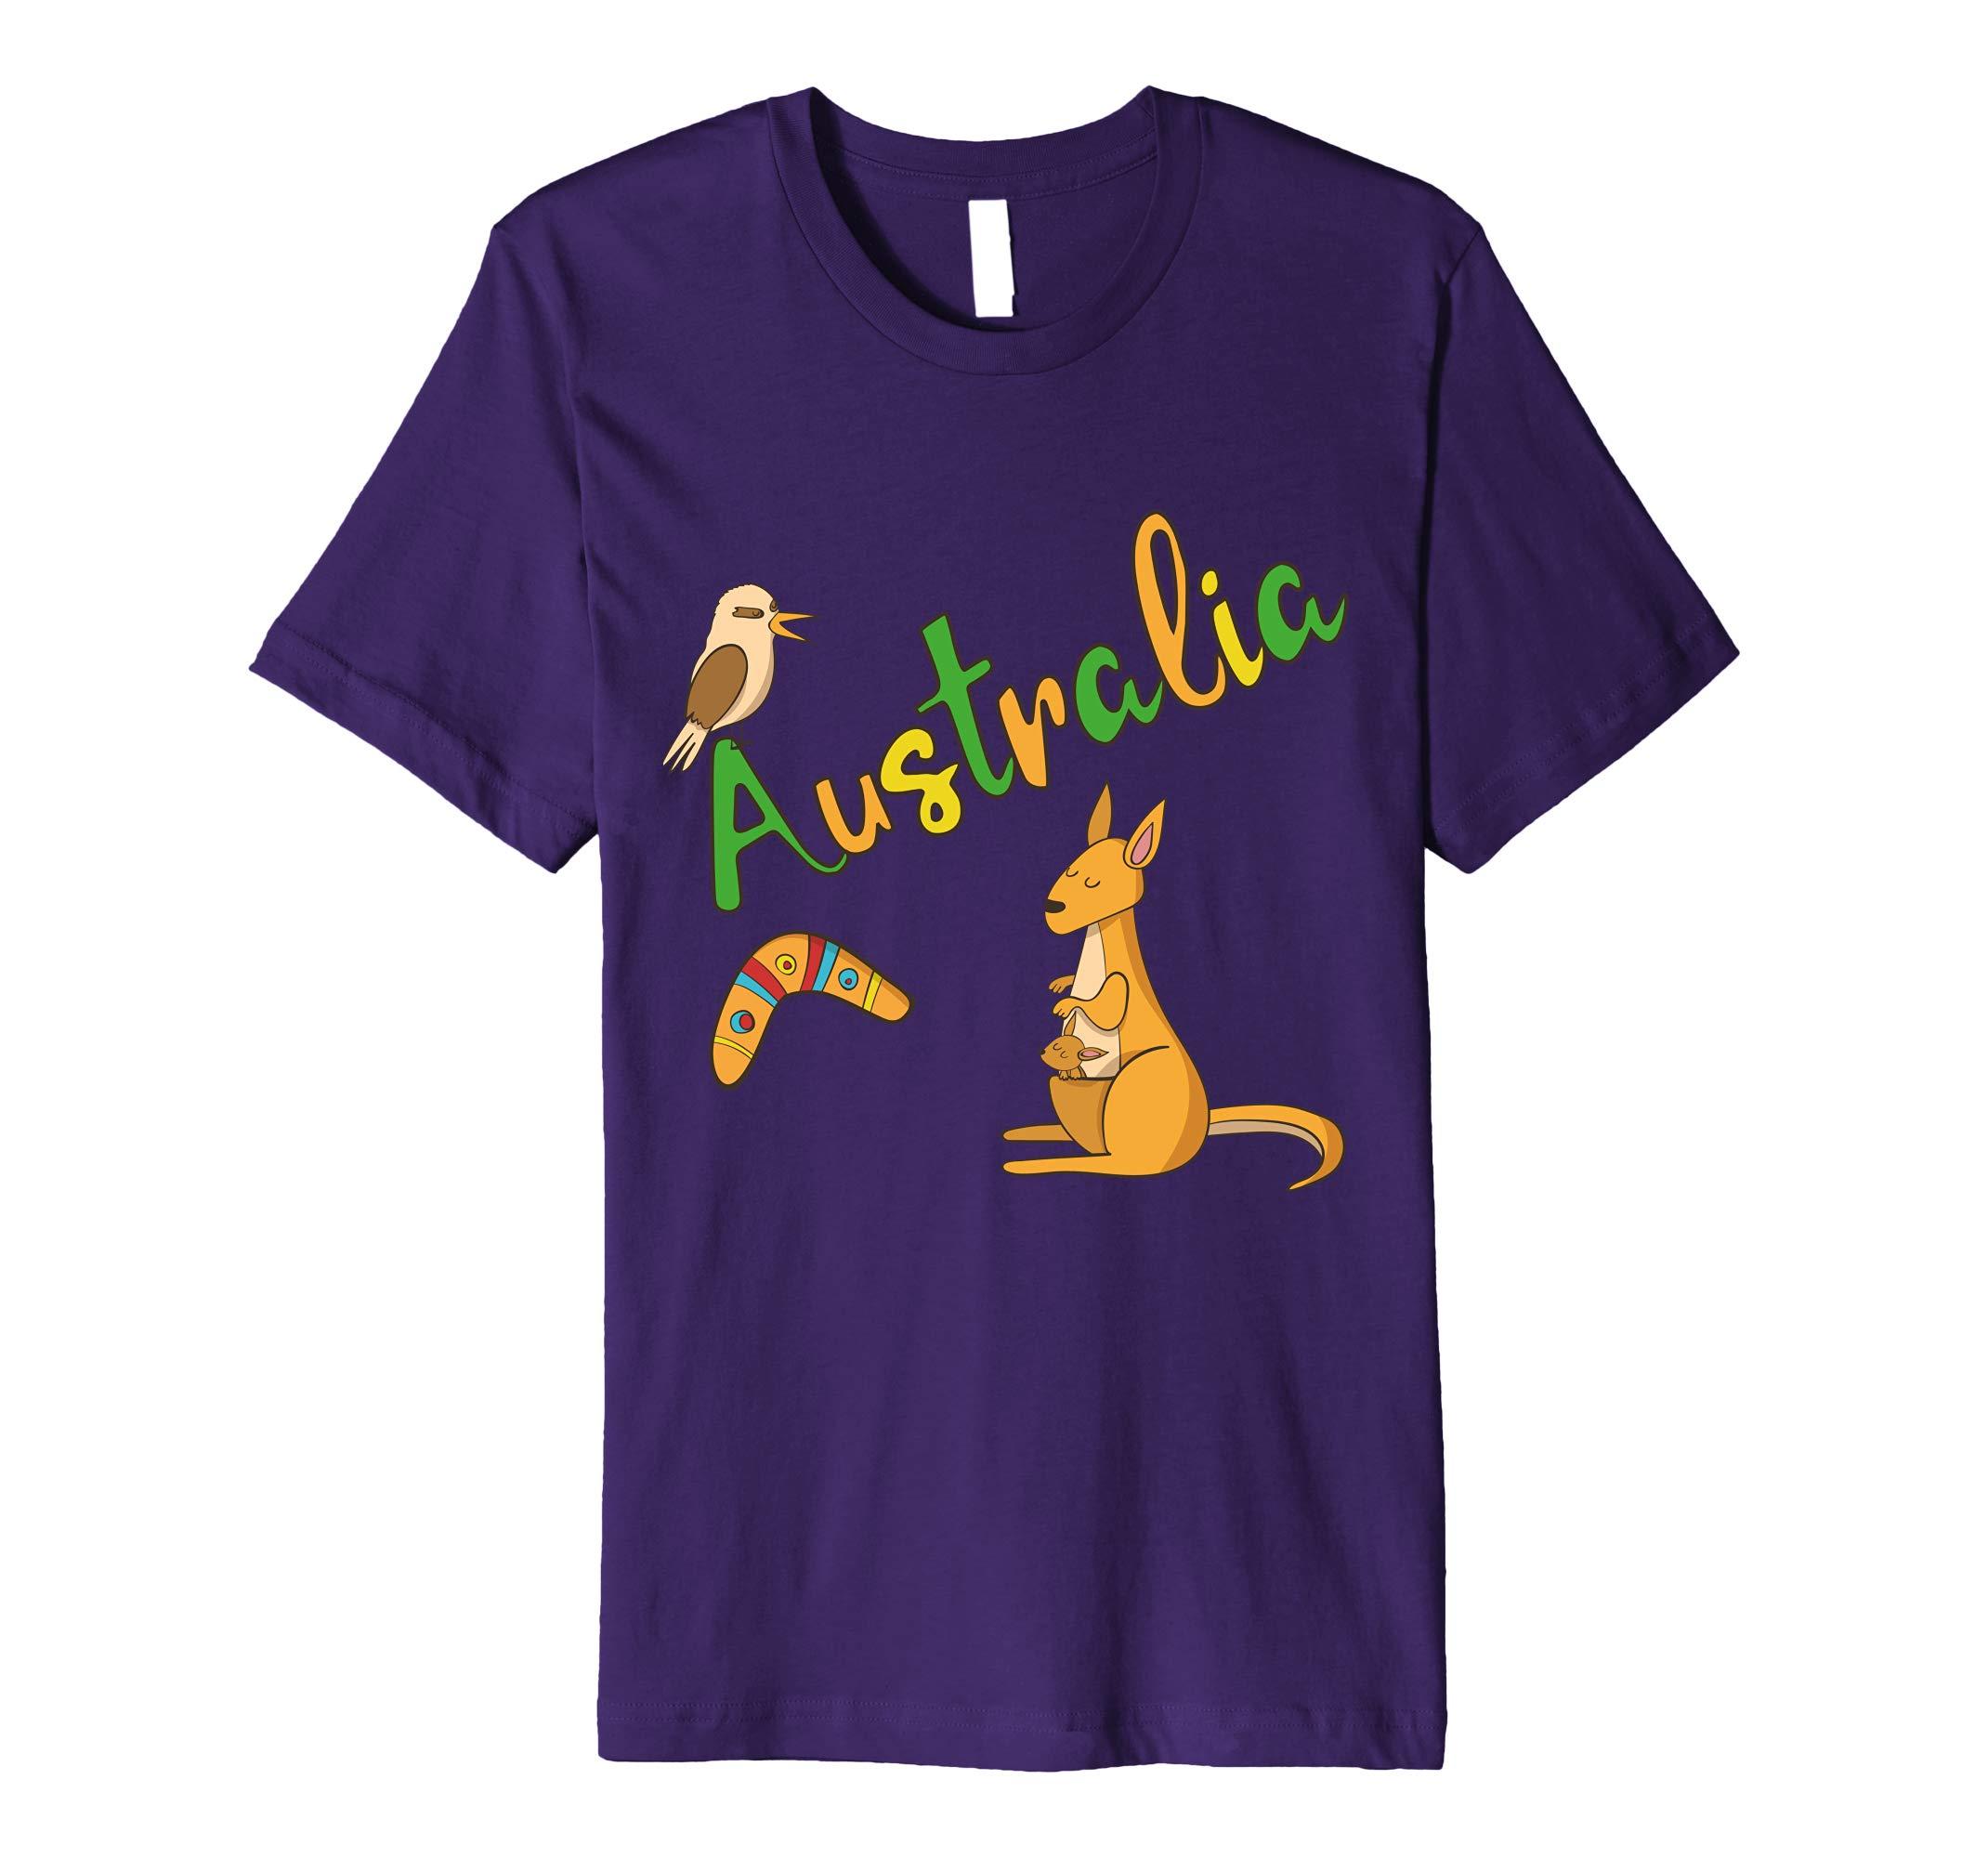 Australia Kangaroo Boomerang Kookaburra T-Shirt-AZP